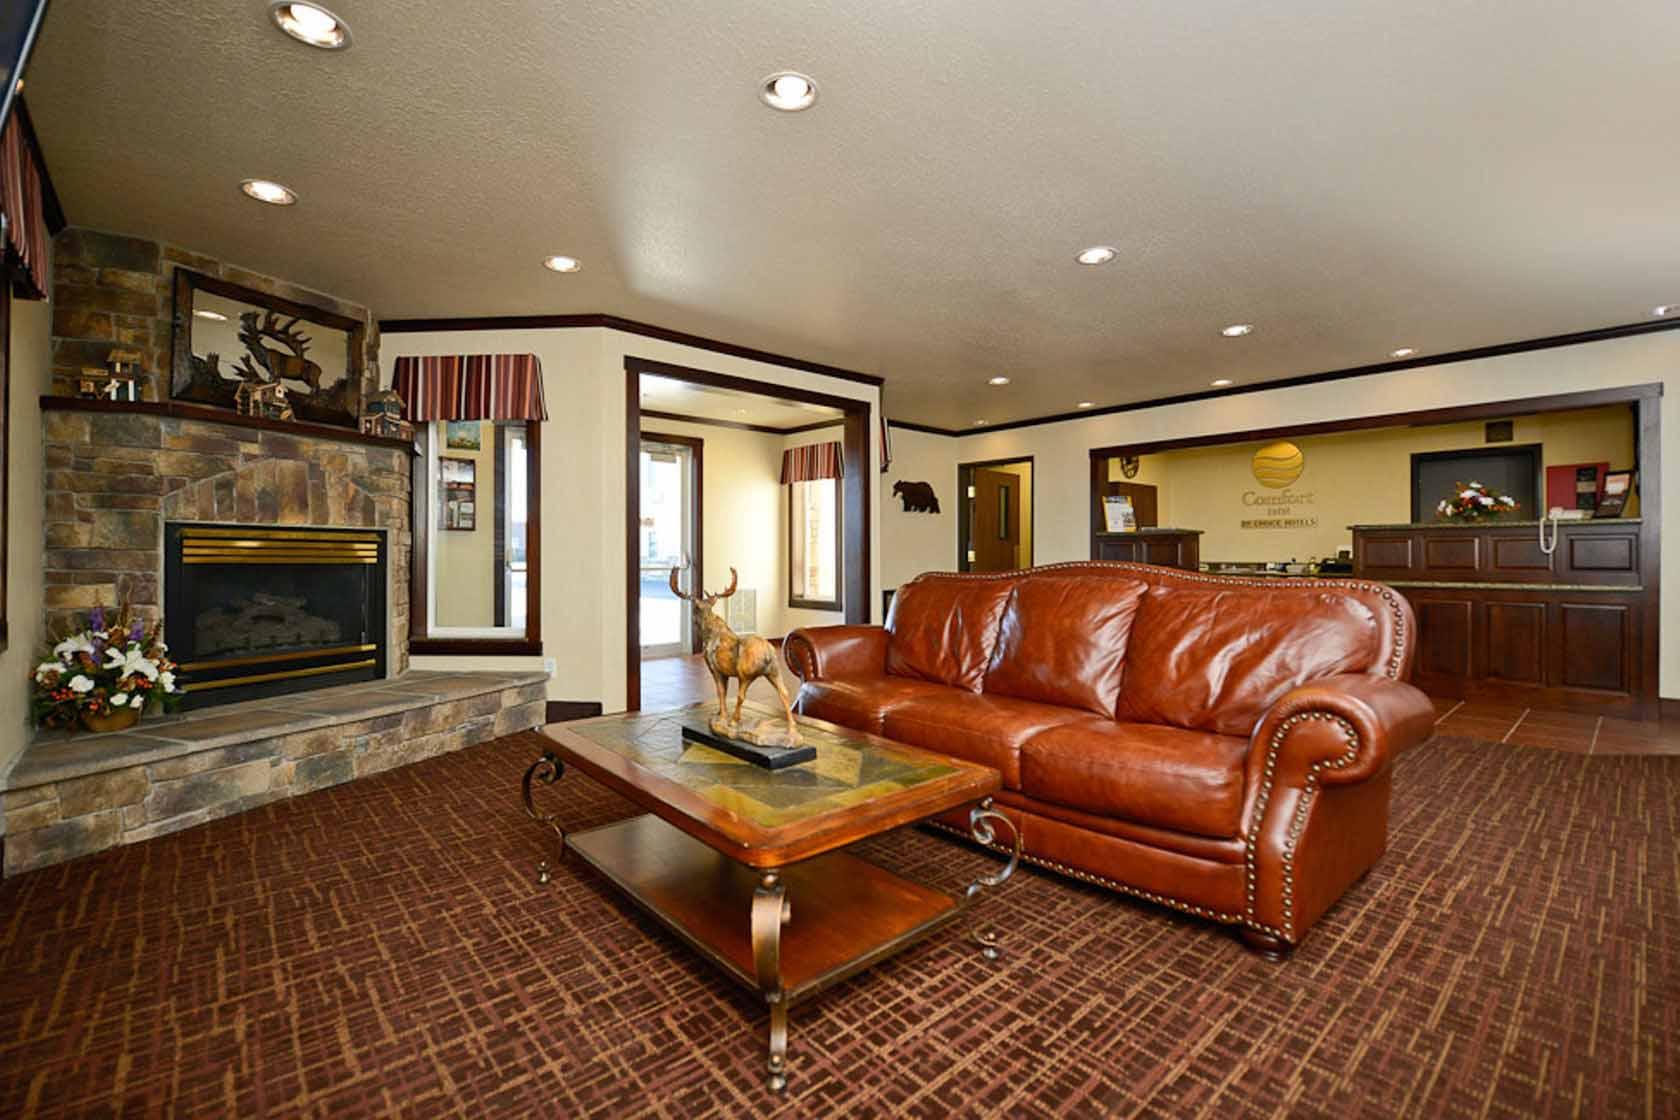 Yellowstone West Gate Hotel profile image